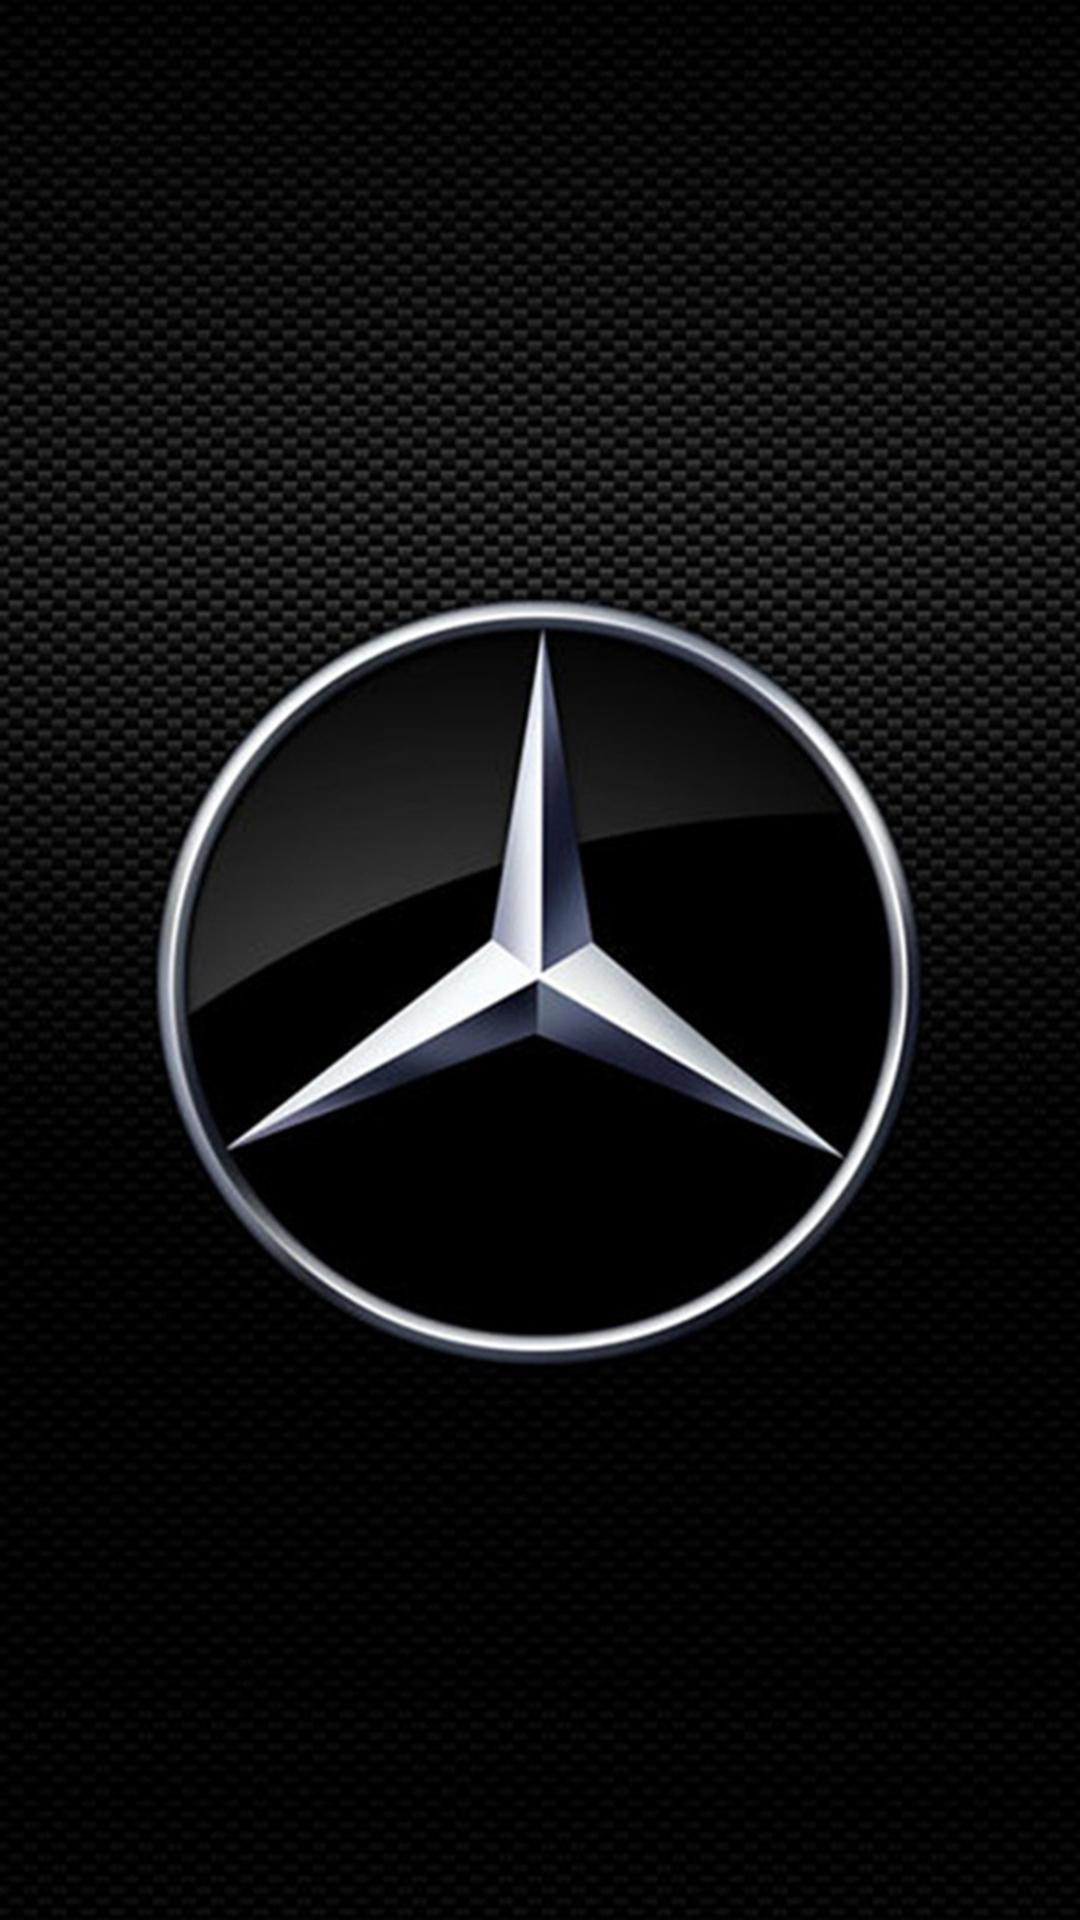 Mercedes Benz Logo Wallpapers Wallpapersafari